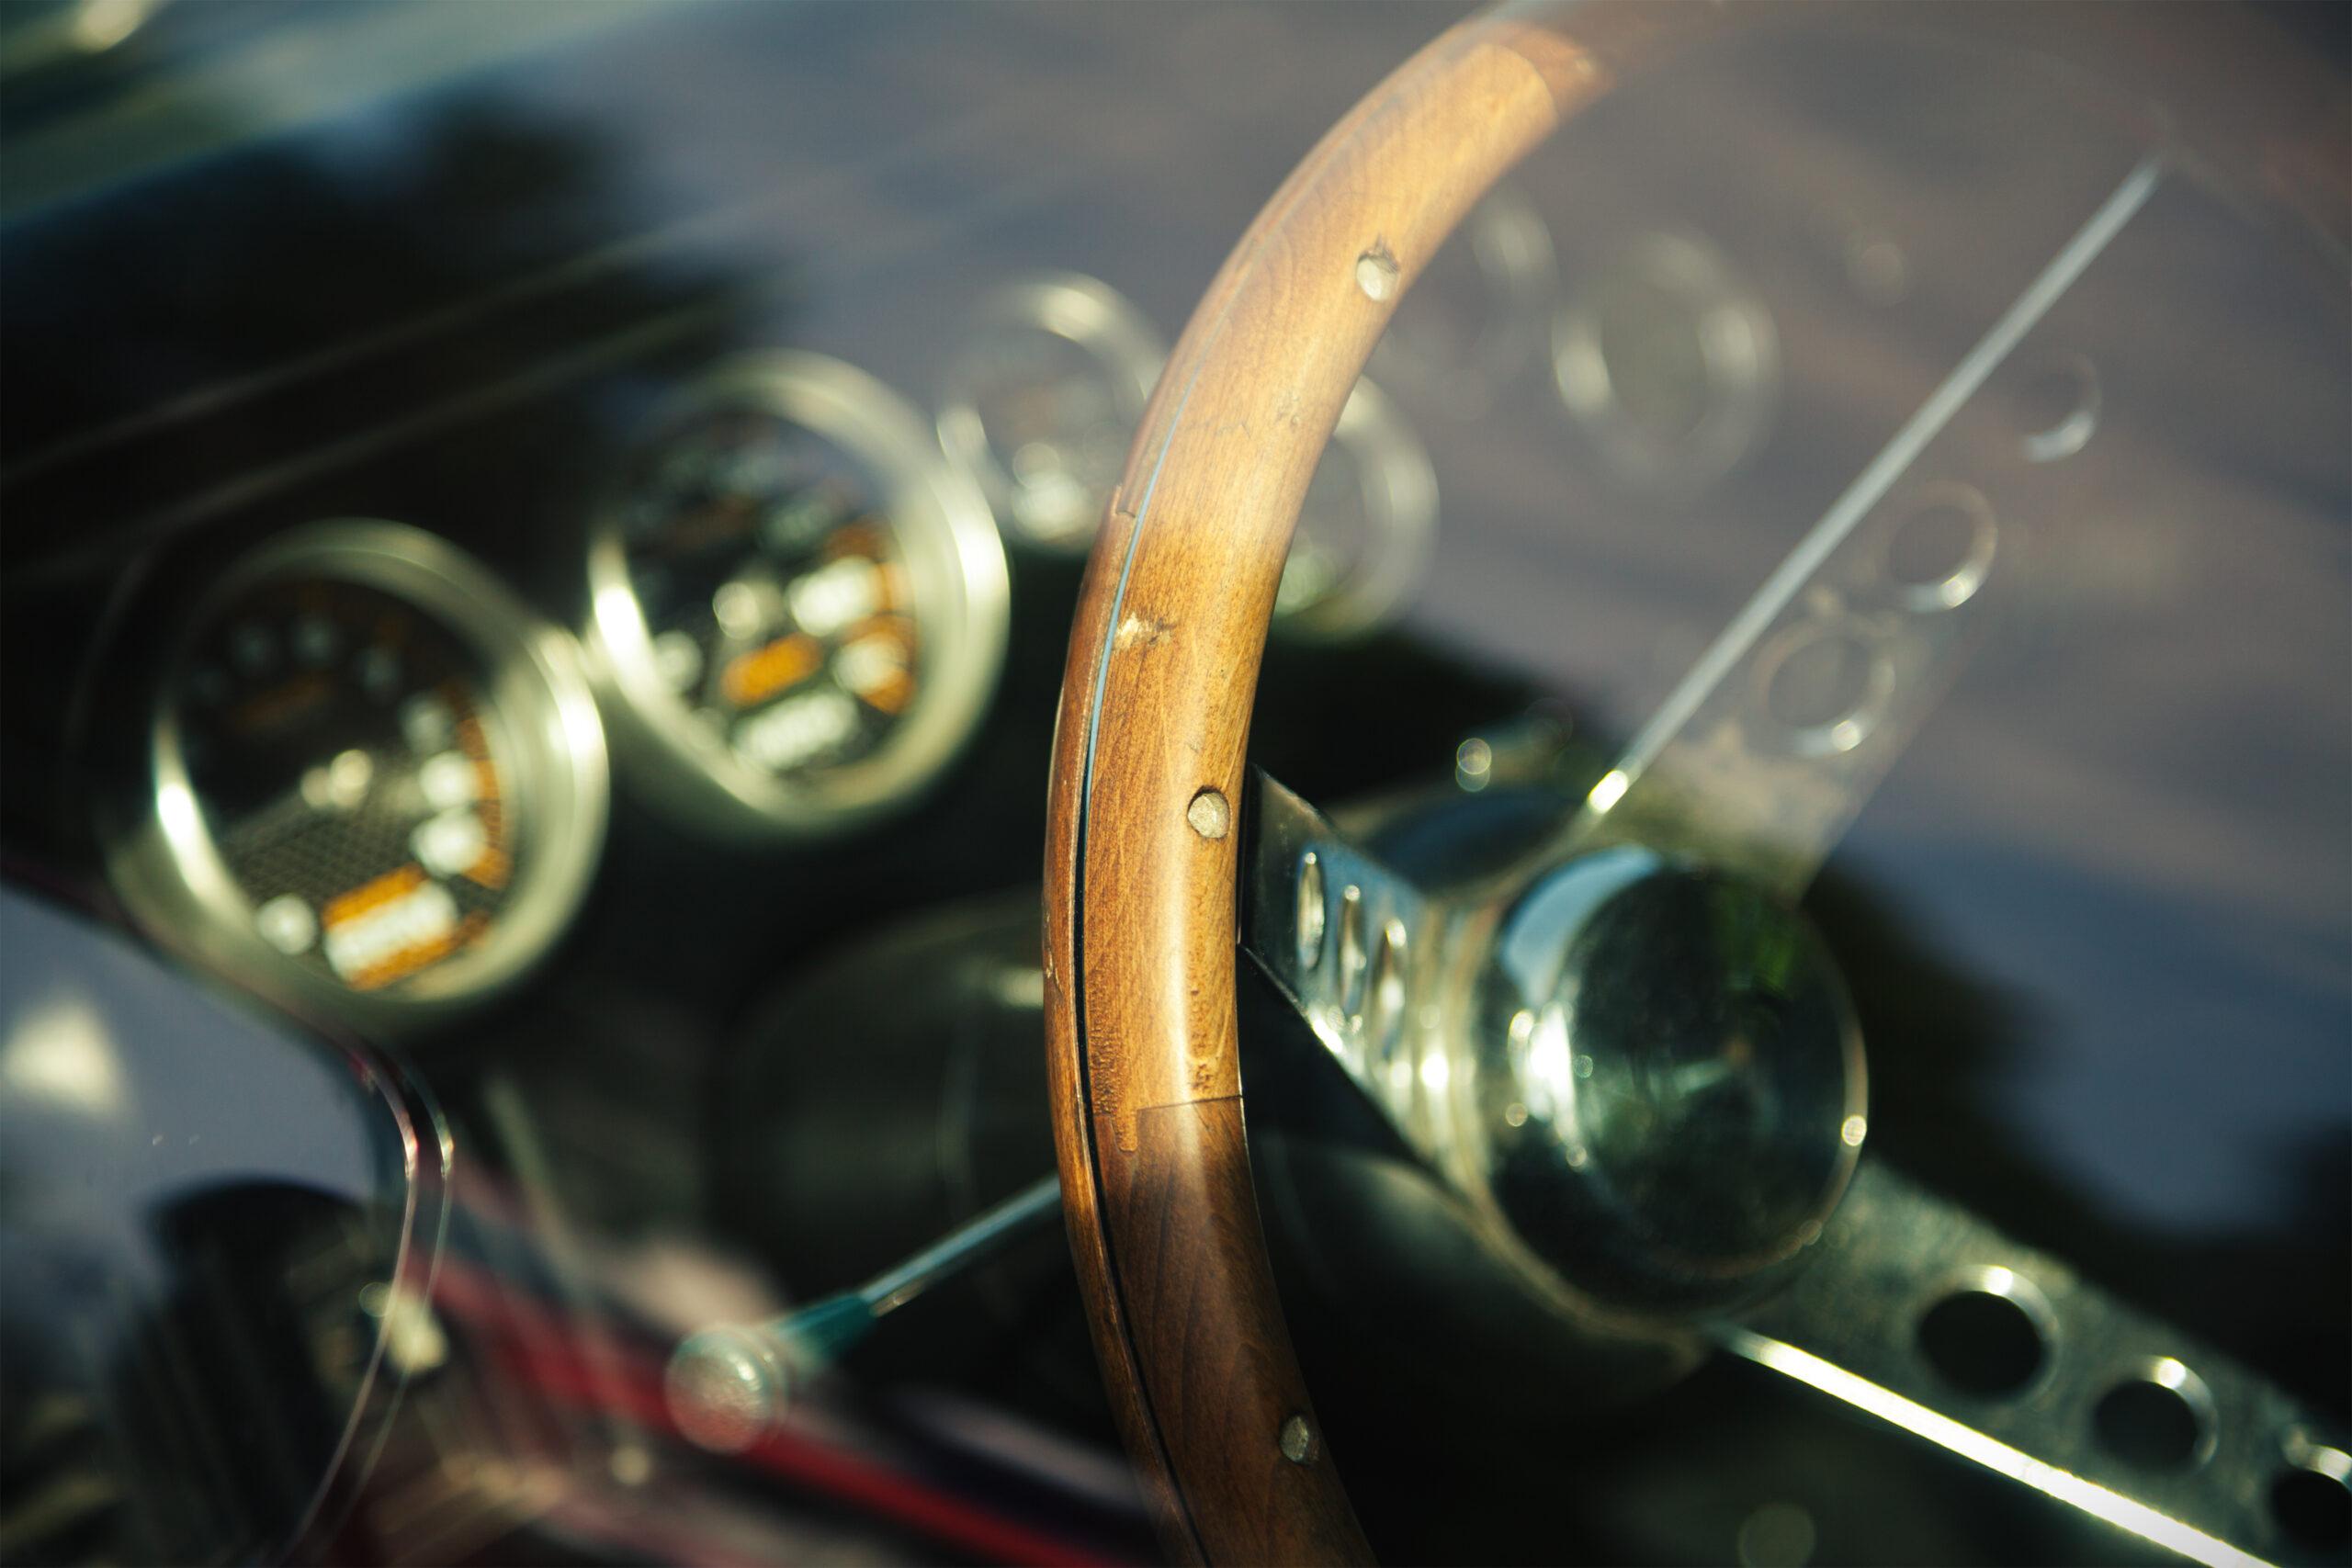 Interior photo of the American classic car